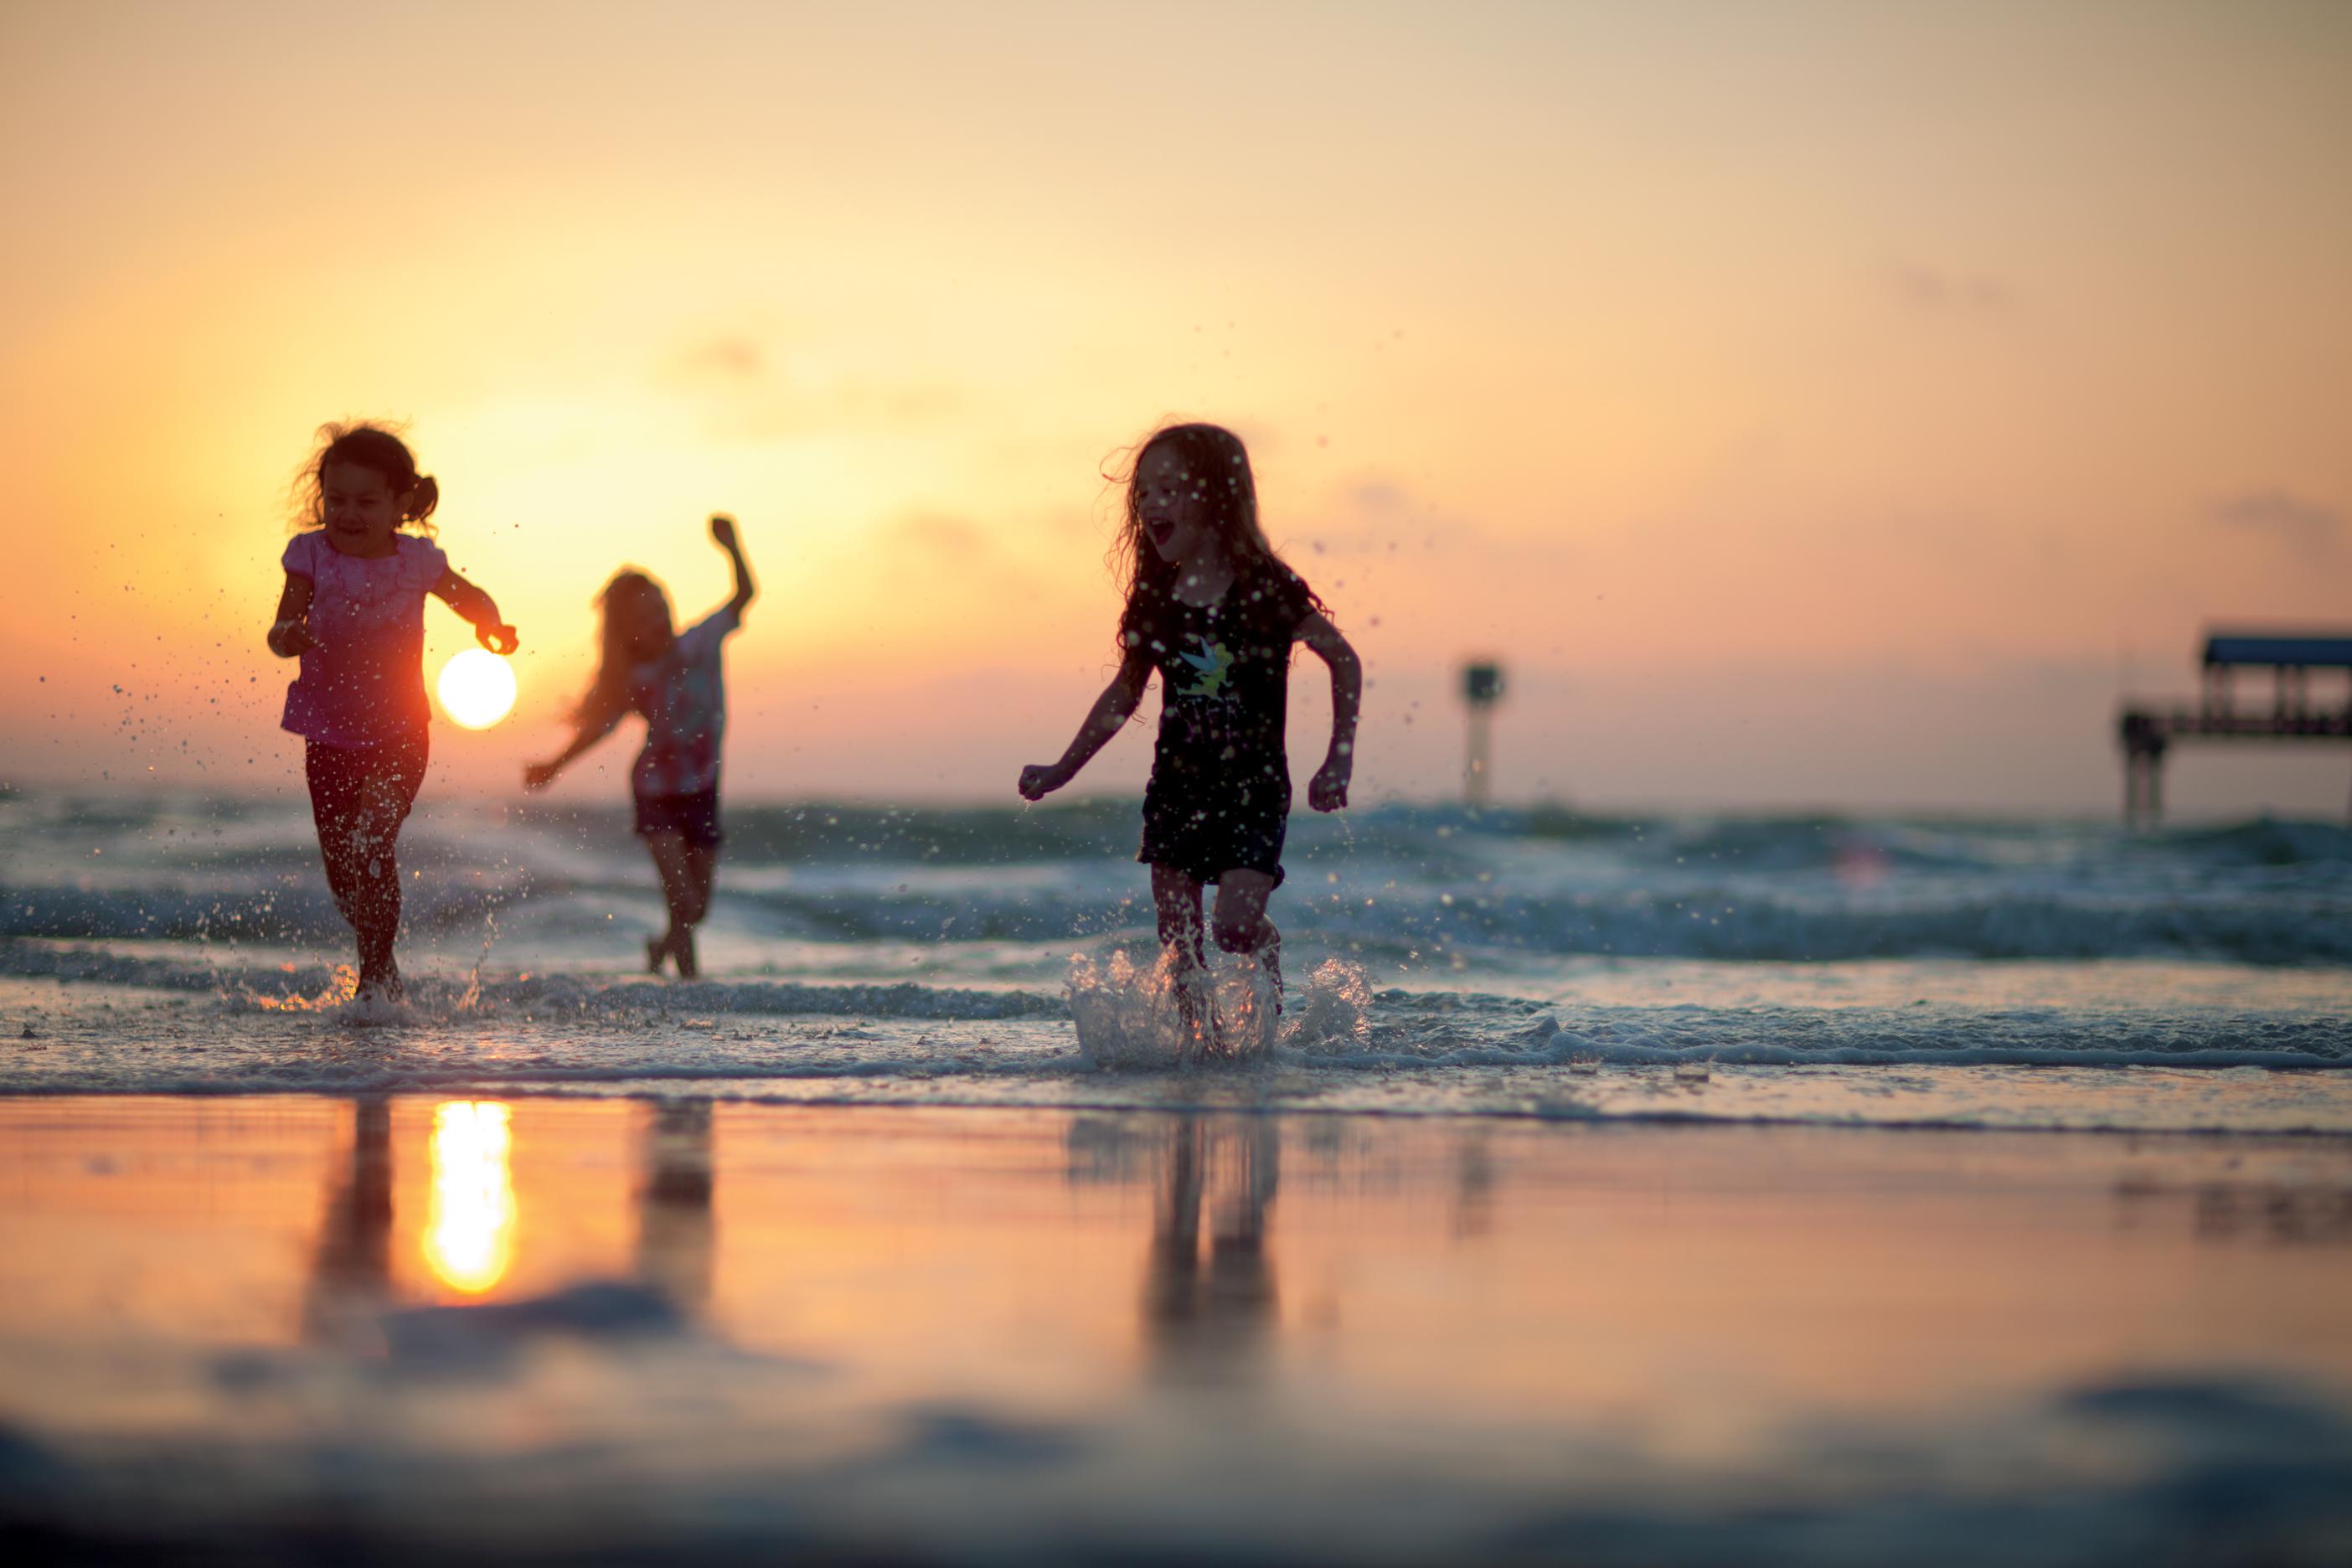 clearwater beach single women Meet clearwater girls, clearwater women for free clearwater girls | clearwater women | clearwater girl  dunedin, harbor bluffs, largo, belleair beach, ridgecrest,.